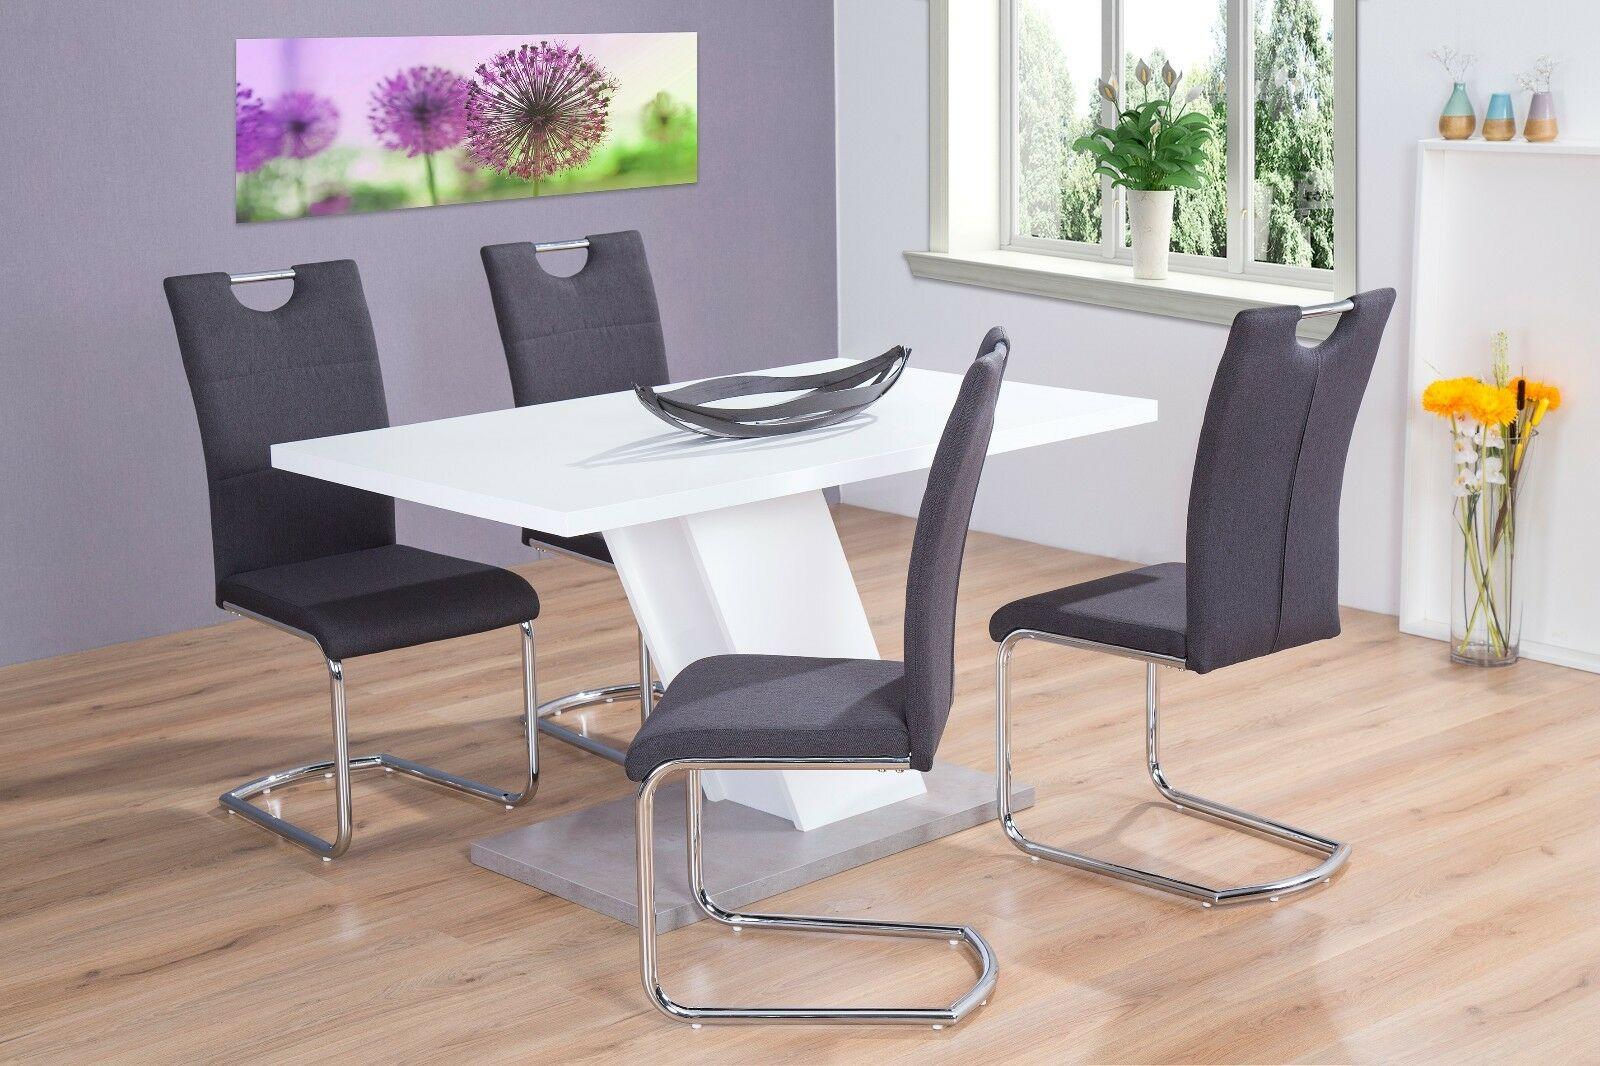 esstisch gnstig elegant full size of esstische gnstig. Black Bedroom Furniture Sets. Home Design Ideas